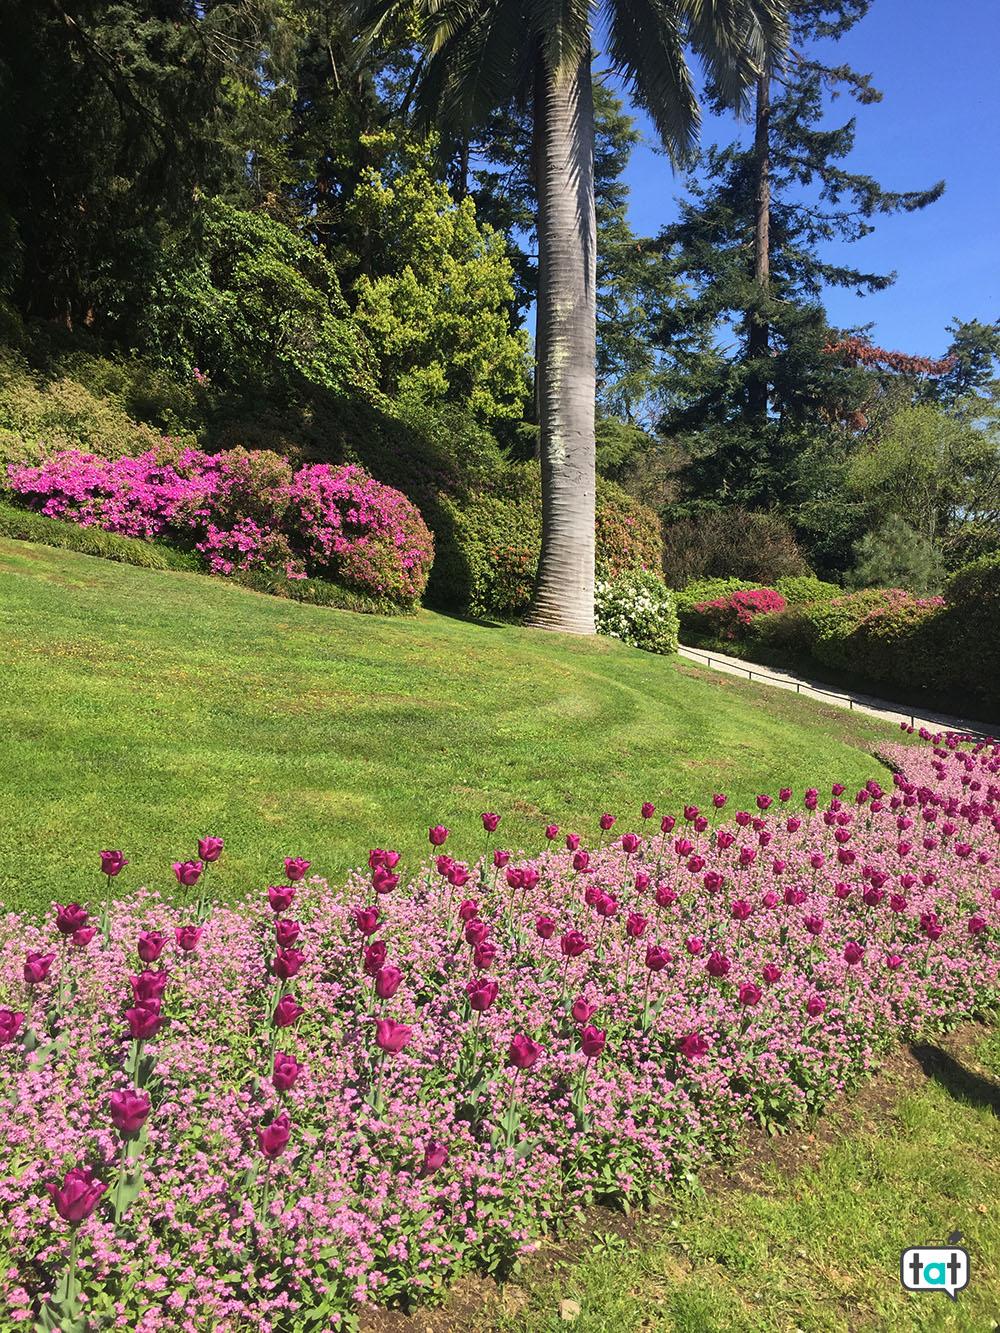 villa carlotta giardini botanici fiori